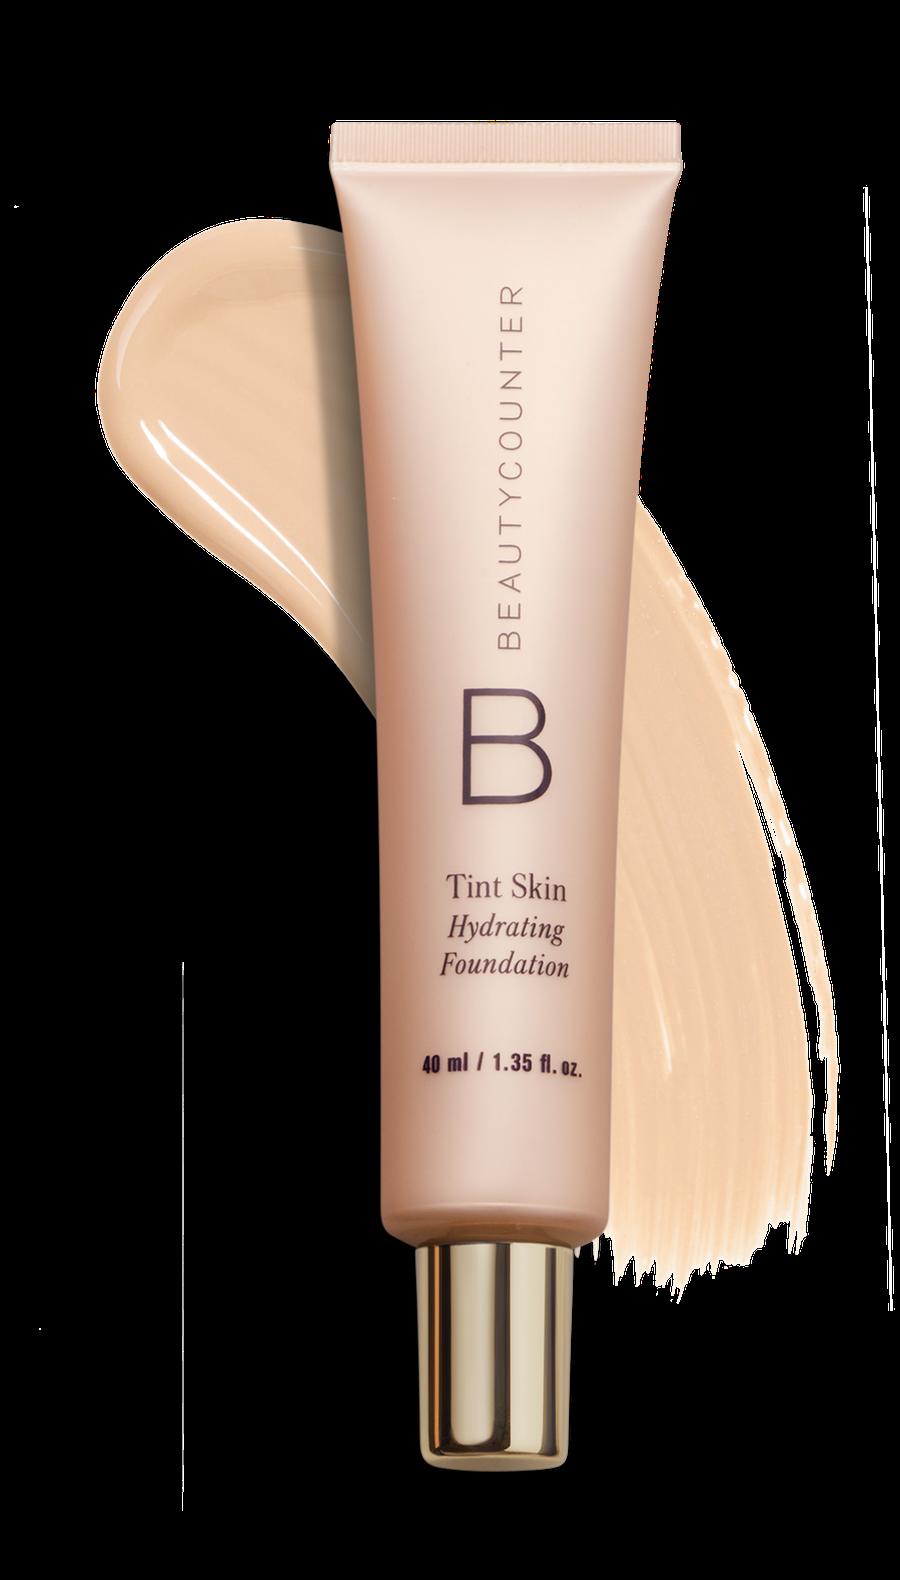 Beautycounter Tint Skin Hydrating Foundation